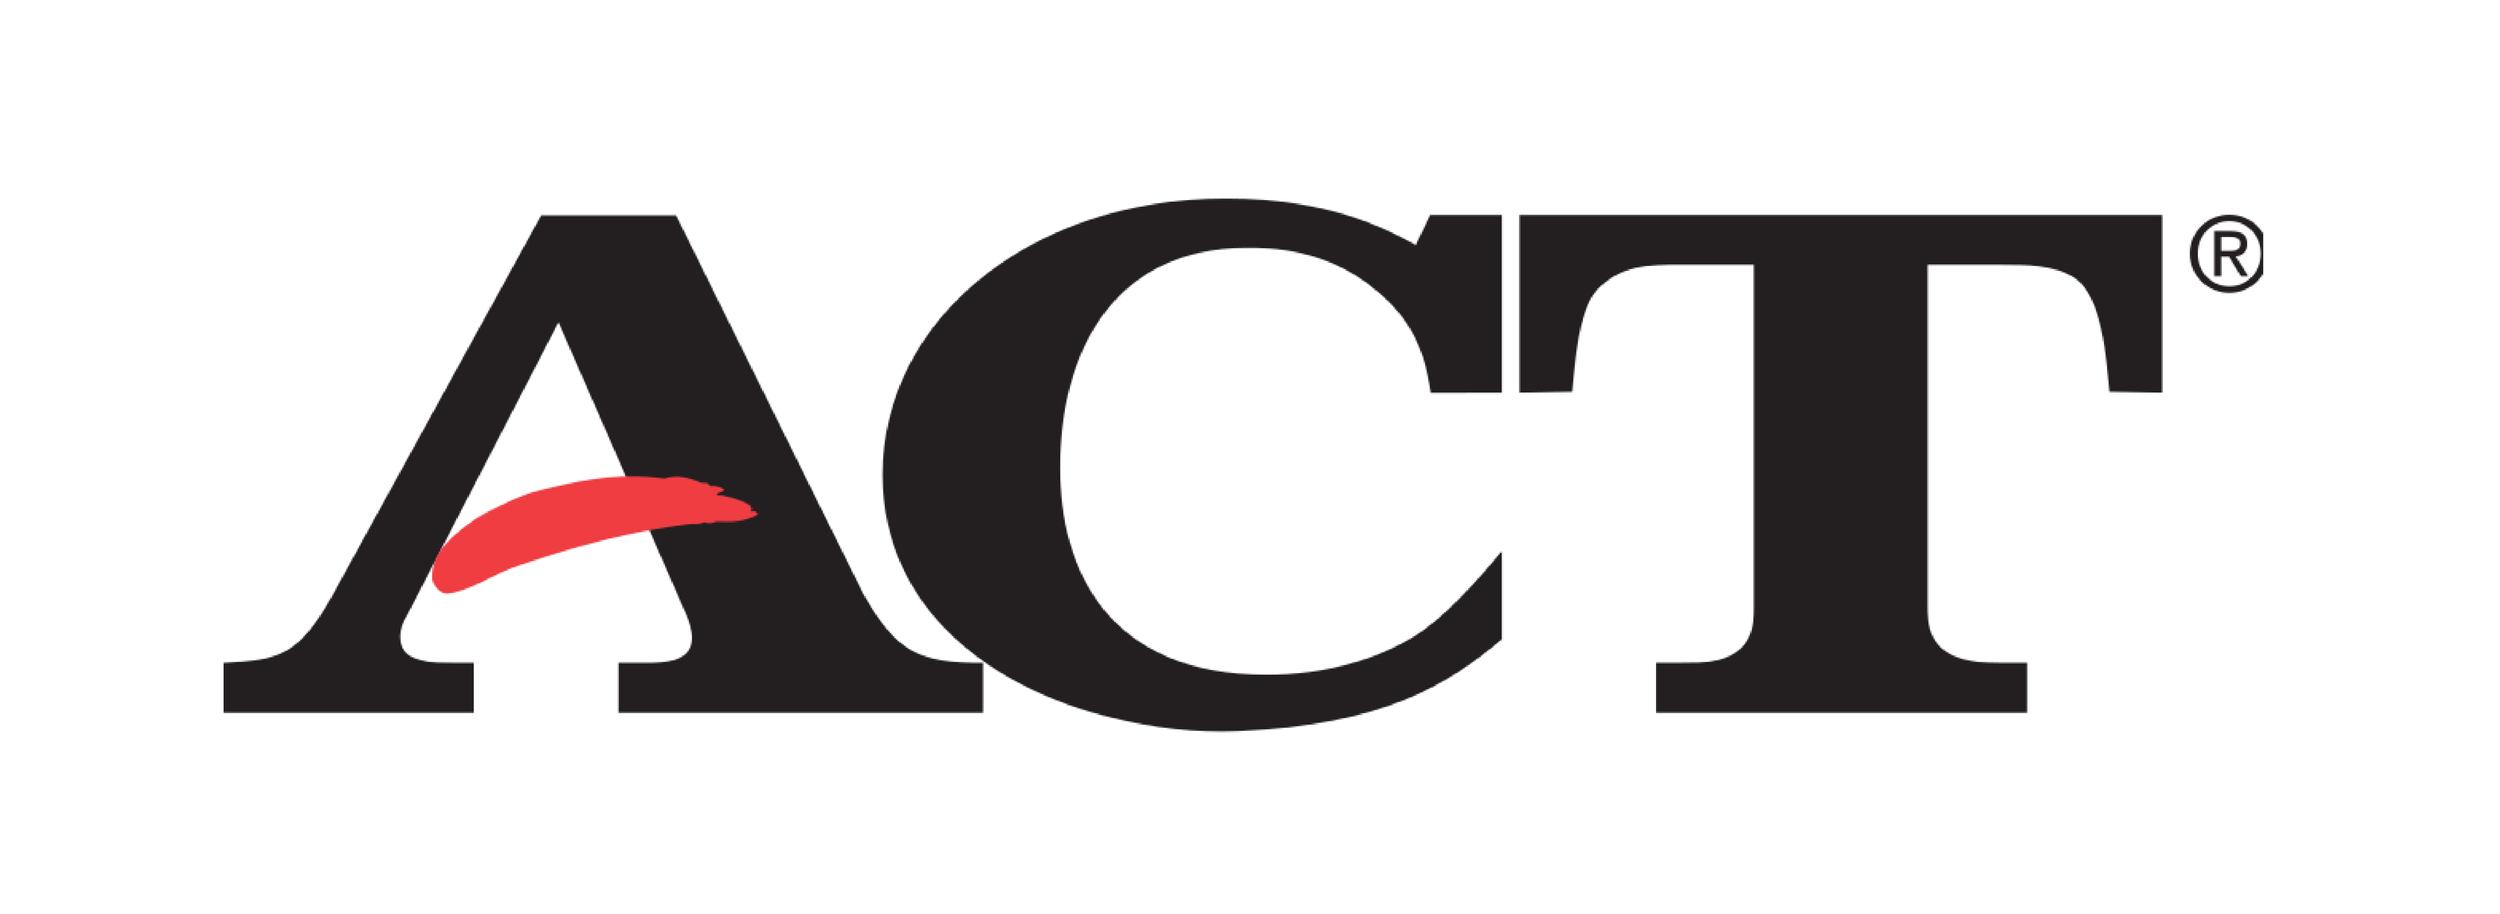 ACT_logo 2.png